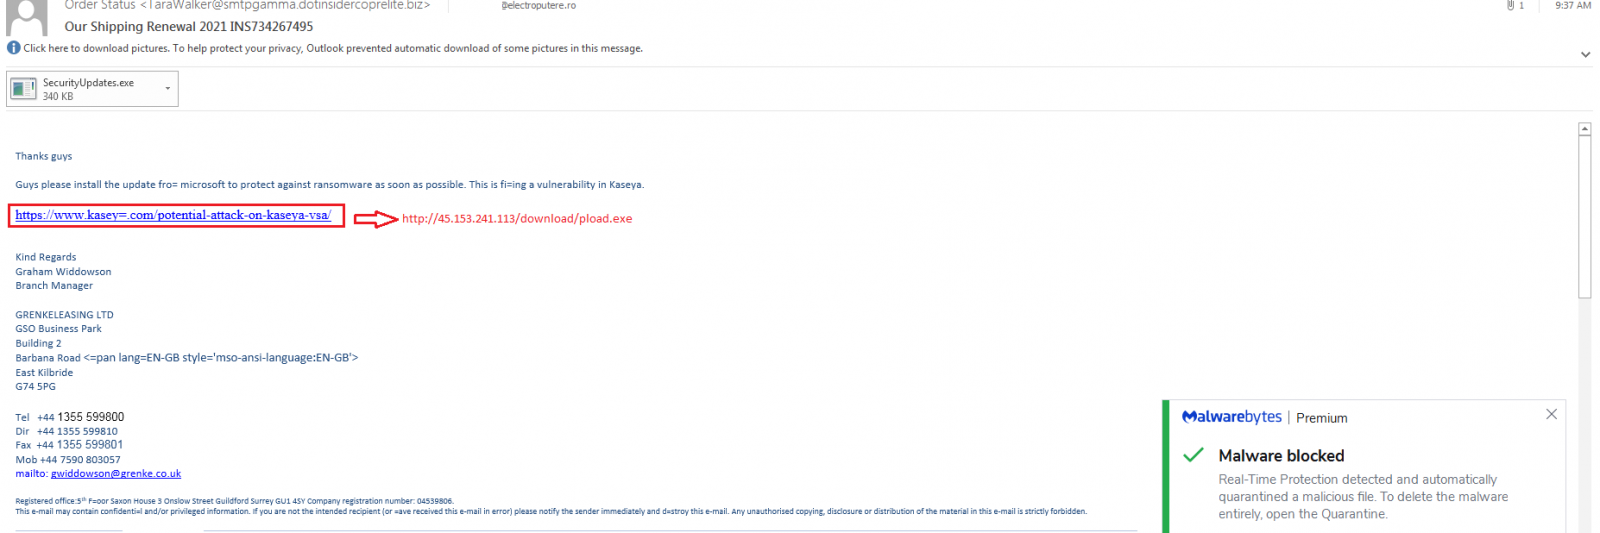 phishing campaign looks to leverage kaseya vsa fears